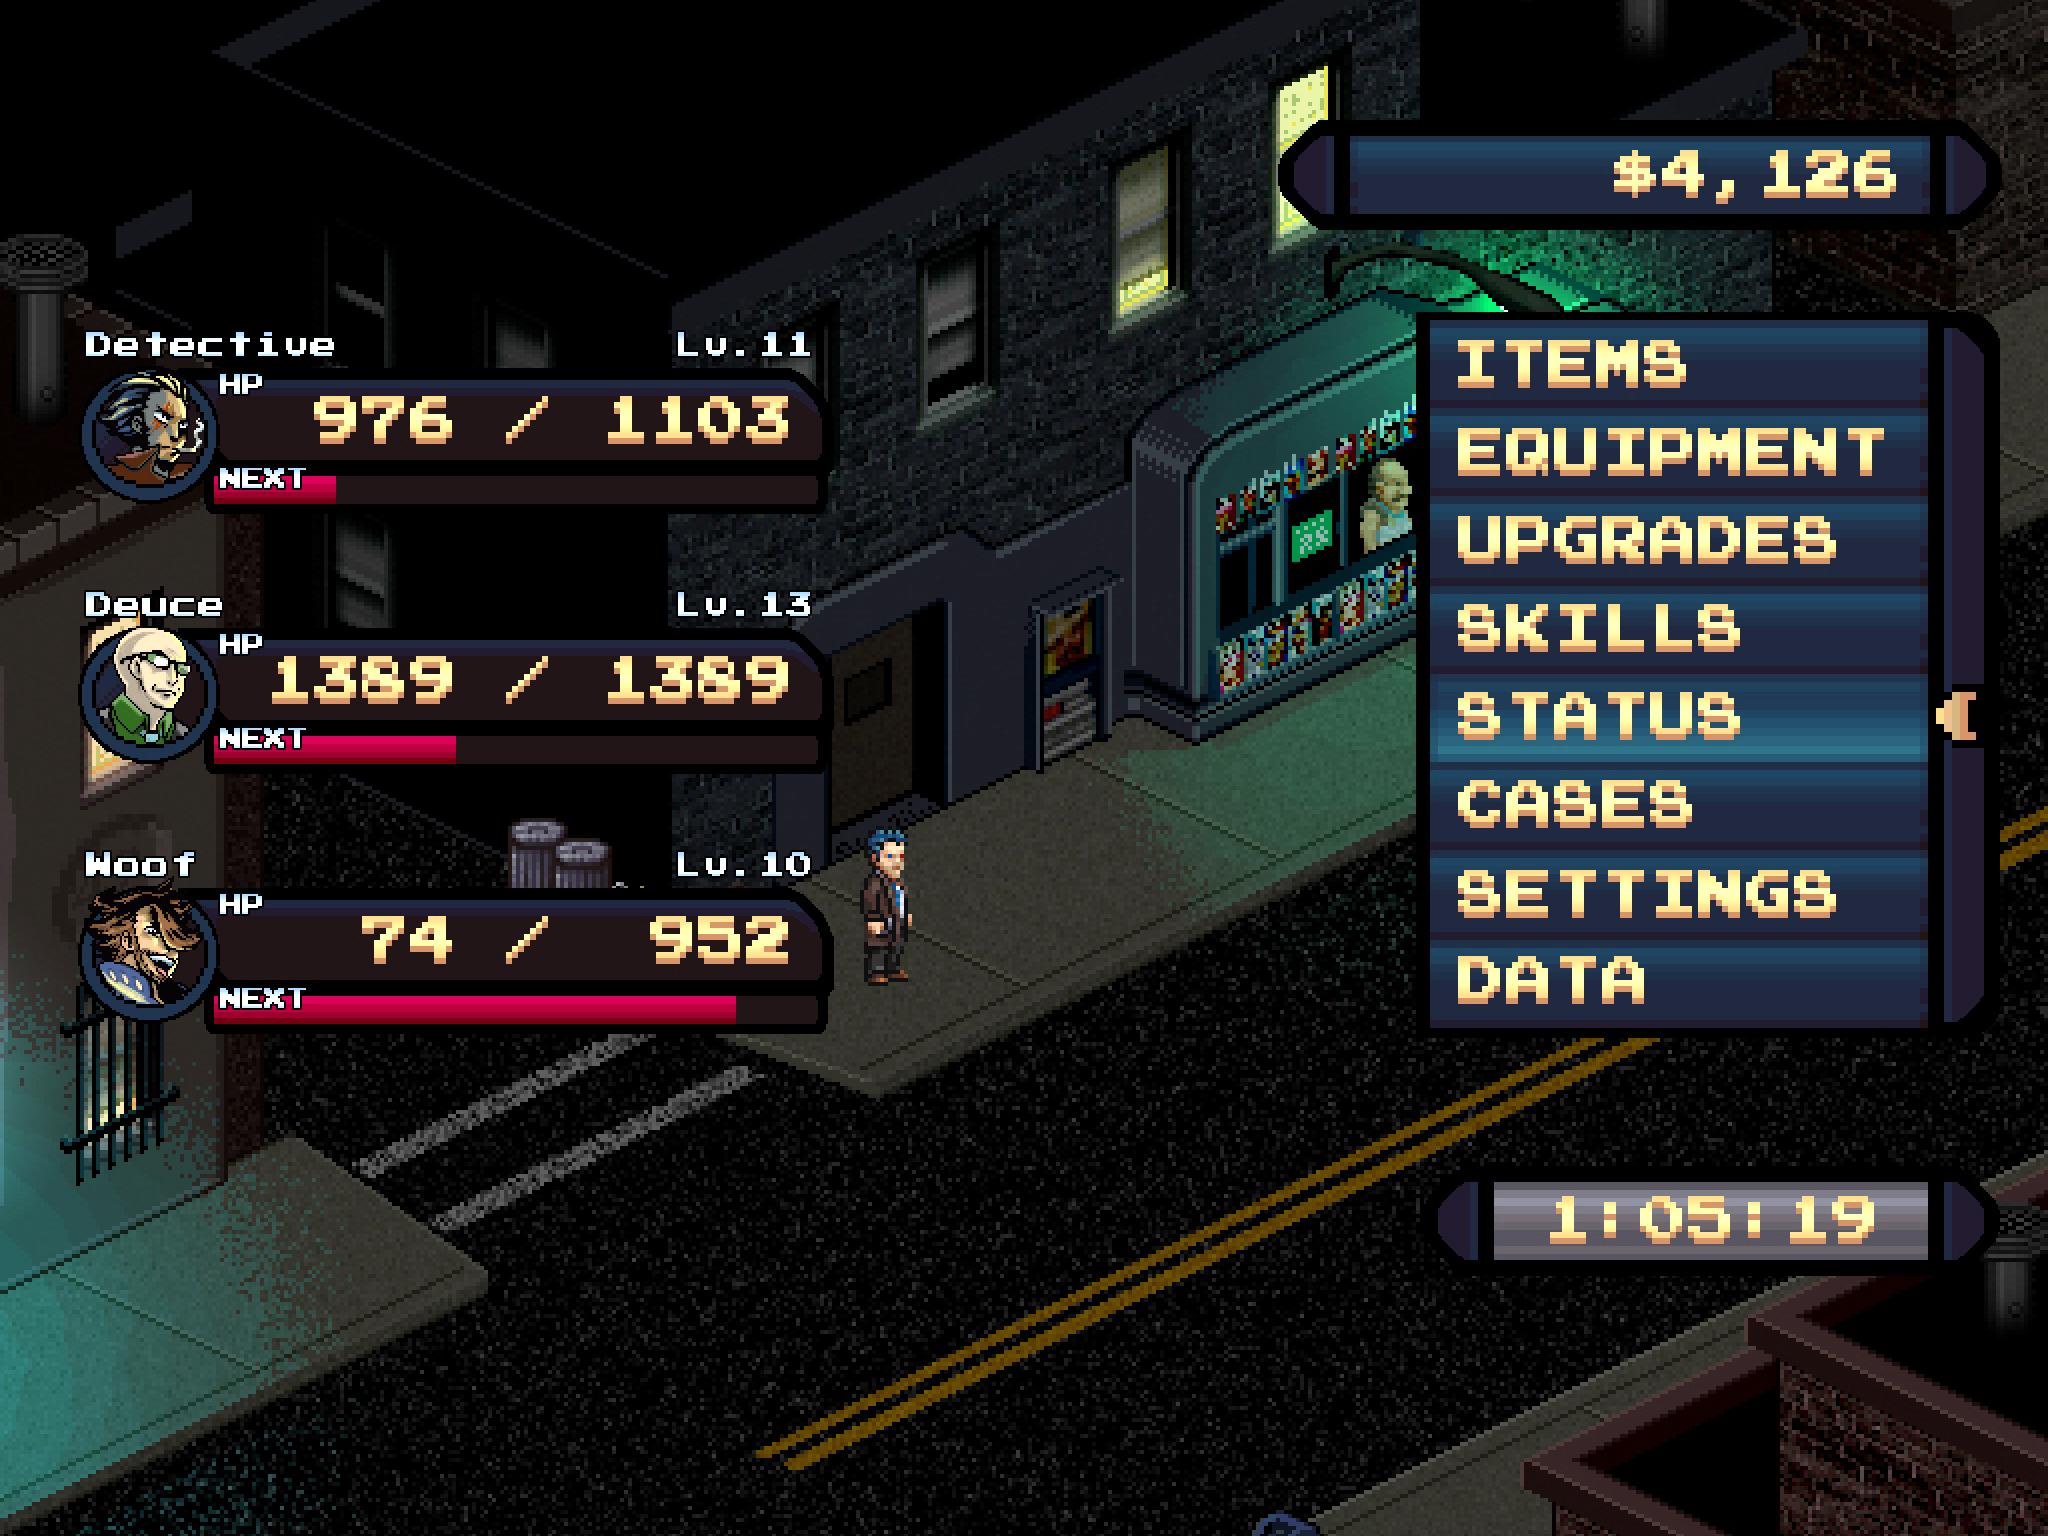 Kickstart this: Pixel Noir is a JRPG-inspired detective game for PS Vita